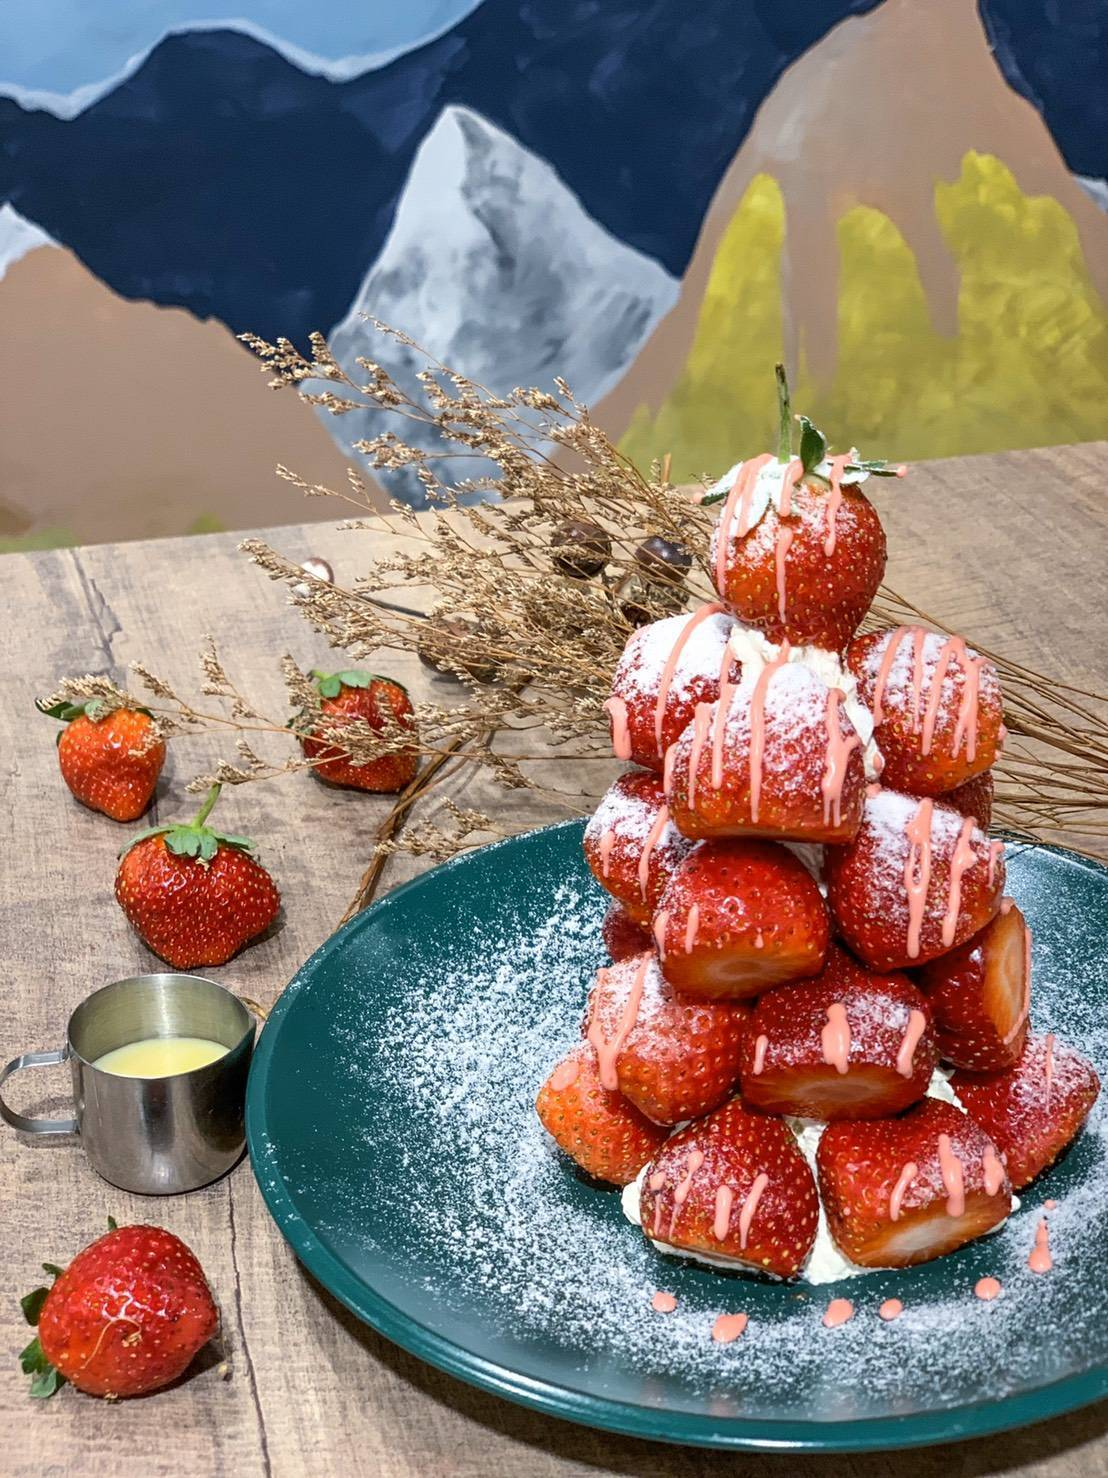 Meat Up莓辦法草莓塔,售價540元。圖/Meat Up提供